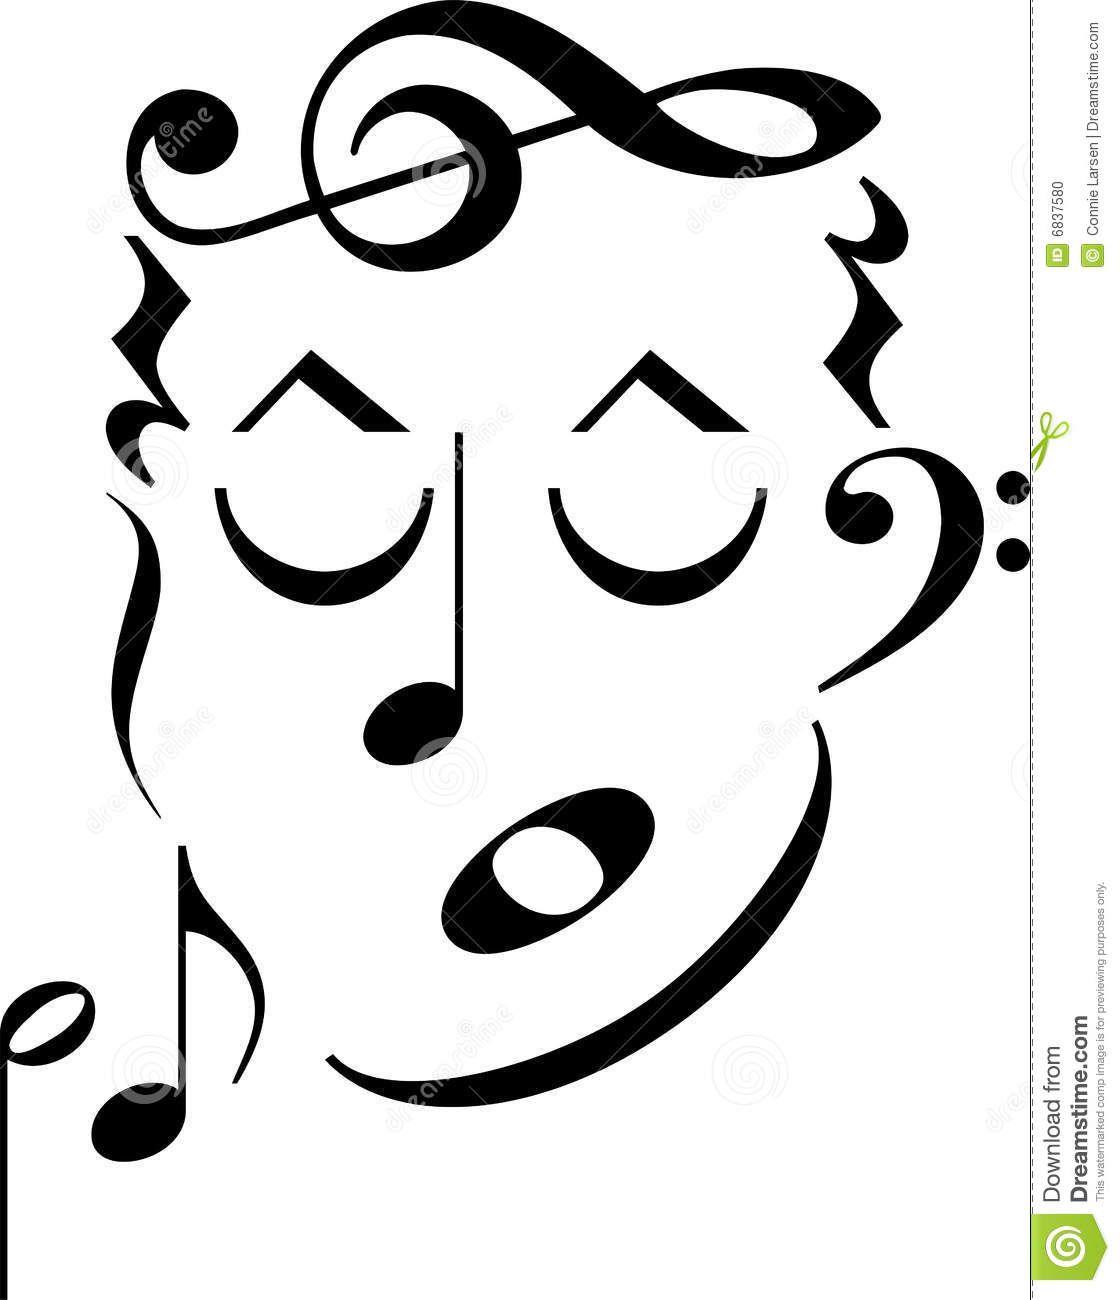 Music Symbols Clip Art